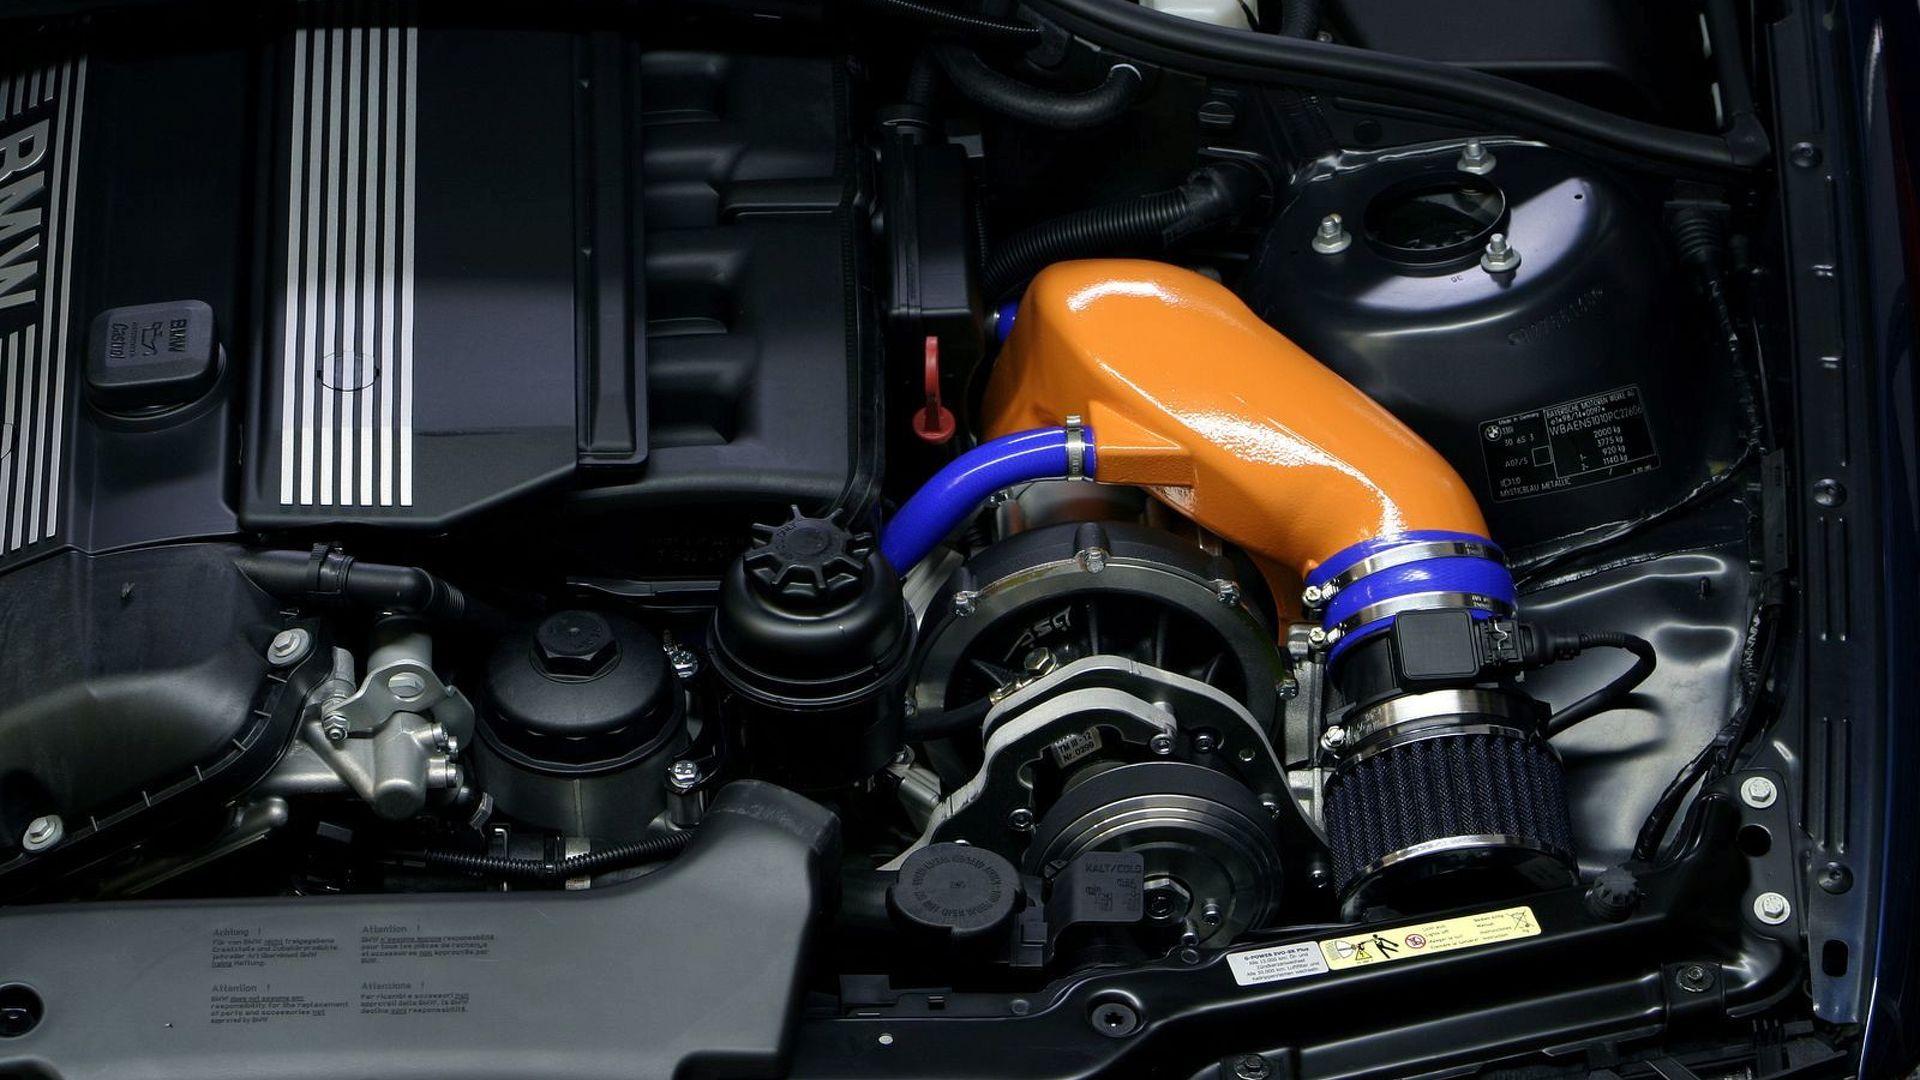 G Power Reanimates Bmw 6 Cylinder M54 Engine 2002 X5 Motor Wiring Harness